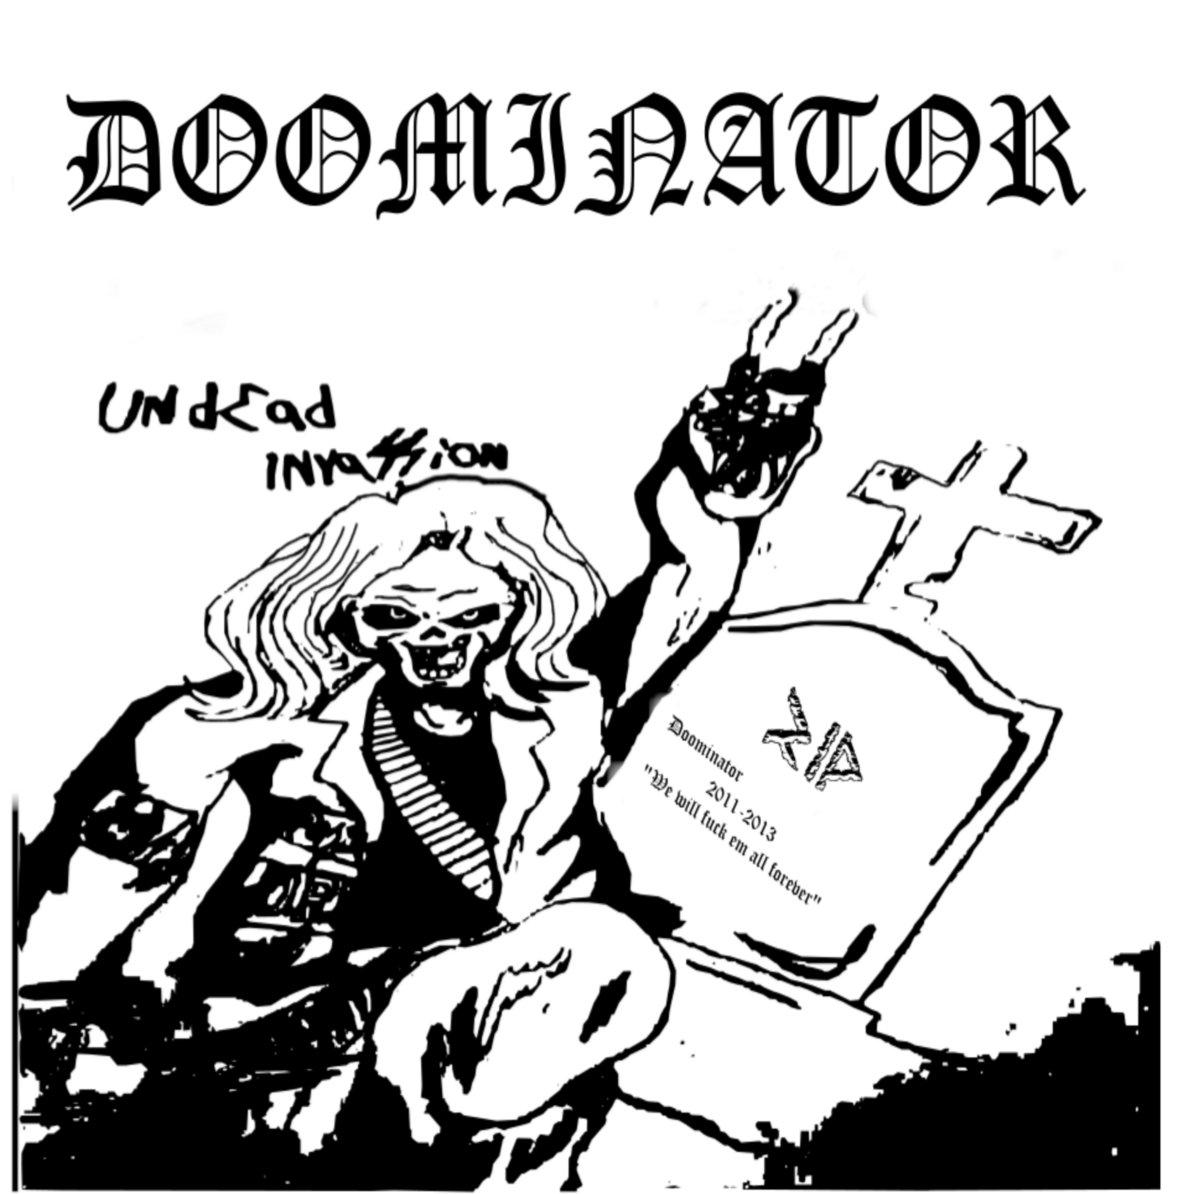 (Fuck)inator   Doominator